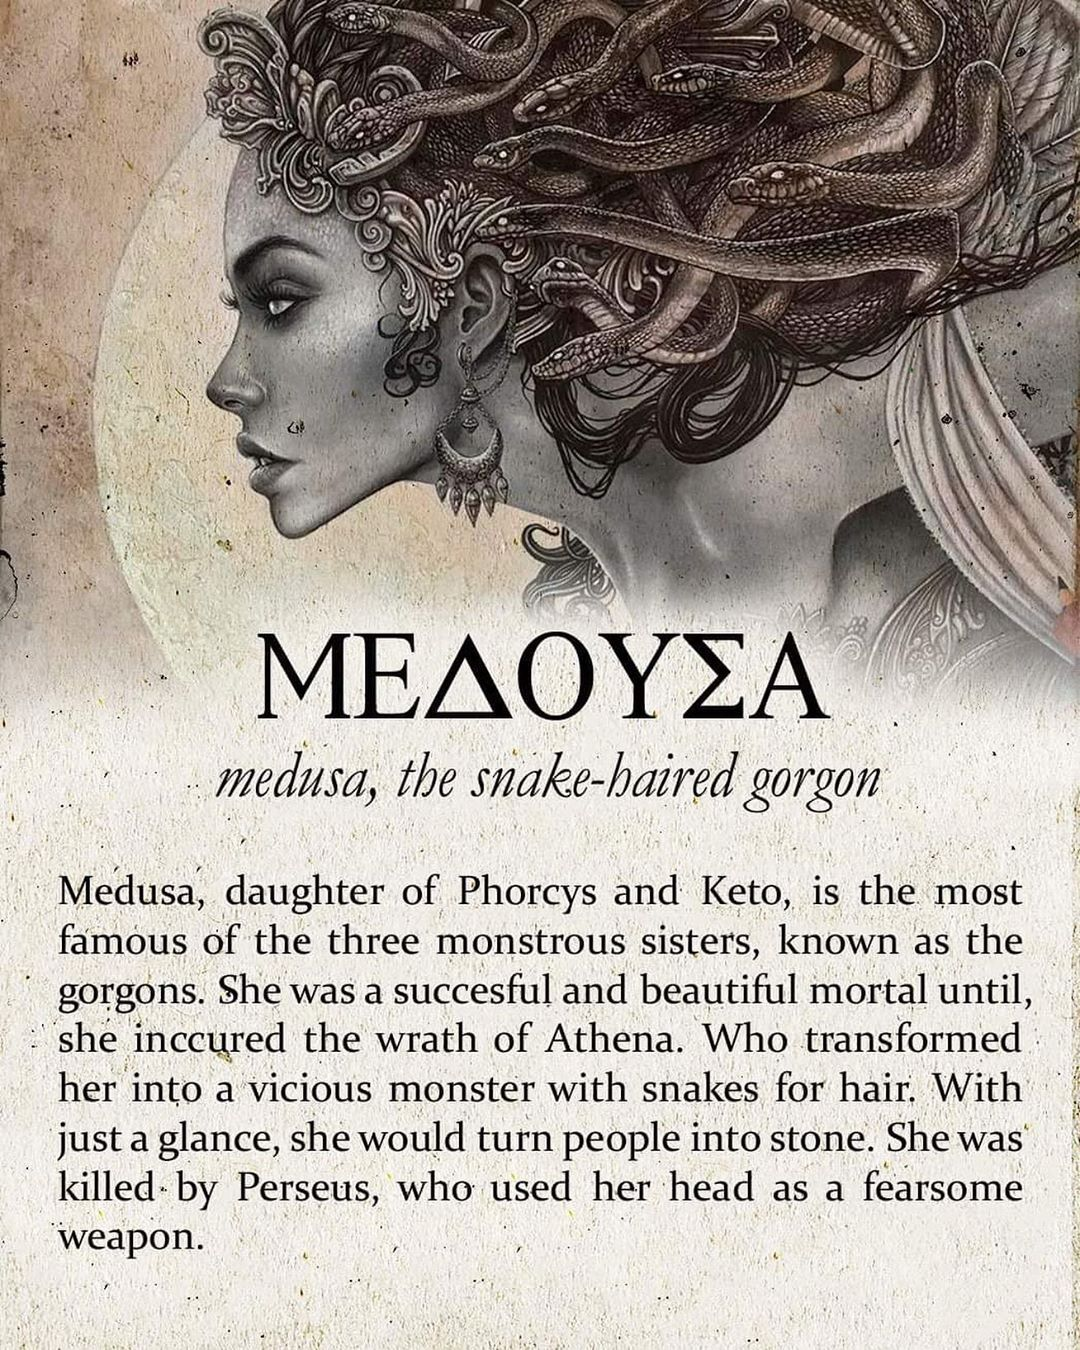 Medusa, the snake-haired gorgon ???? Follow @greeklore⚔️(me